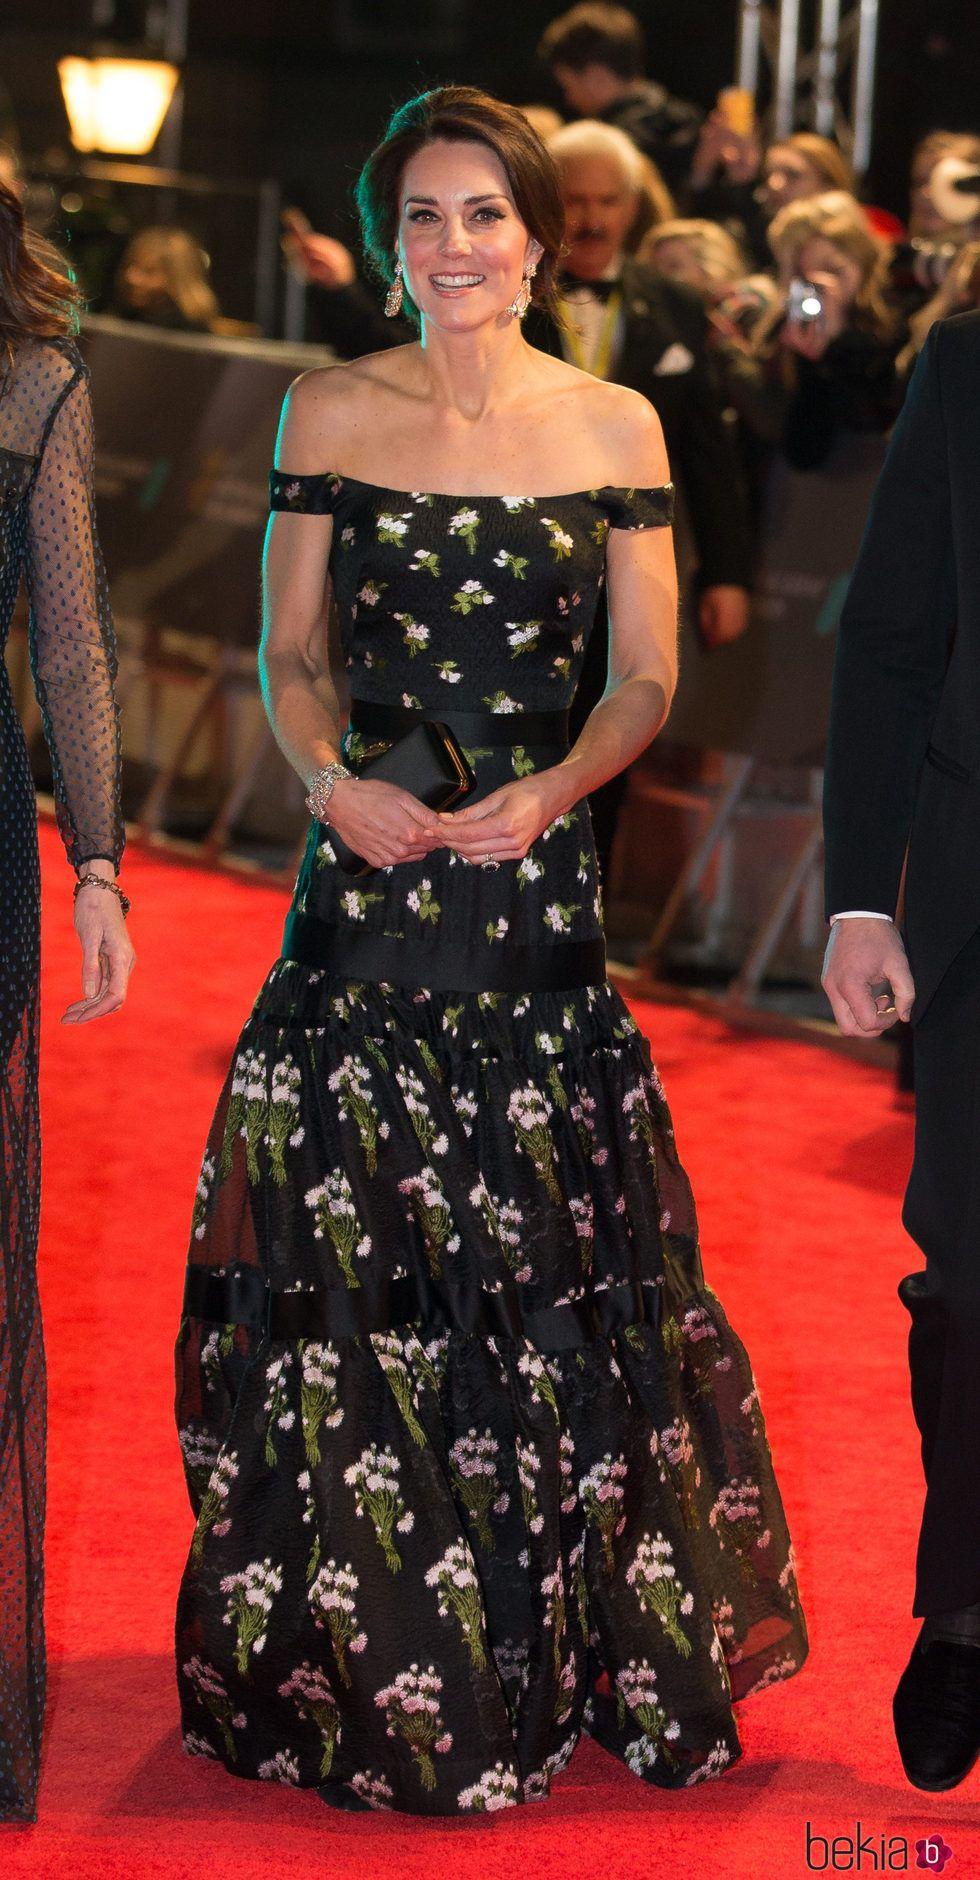 Kate Middleton en la alfombra roja de los Premios Bafta ...